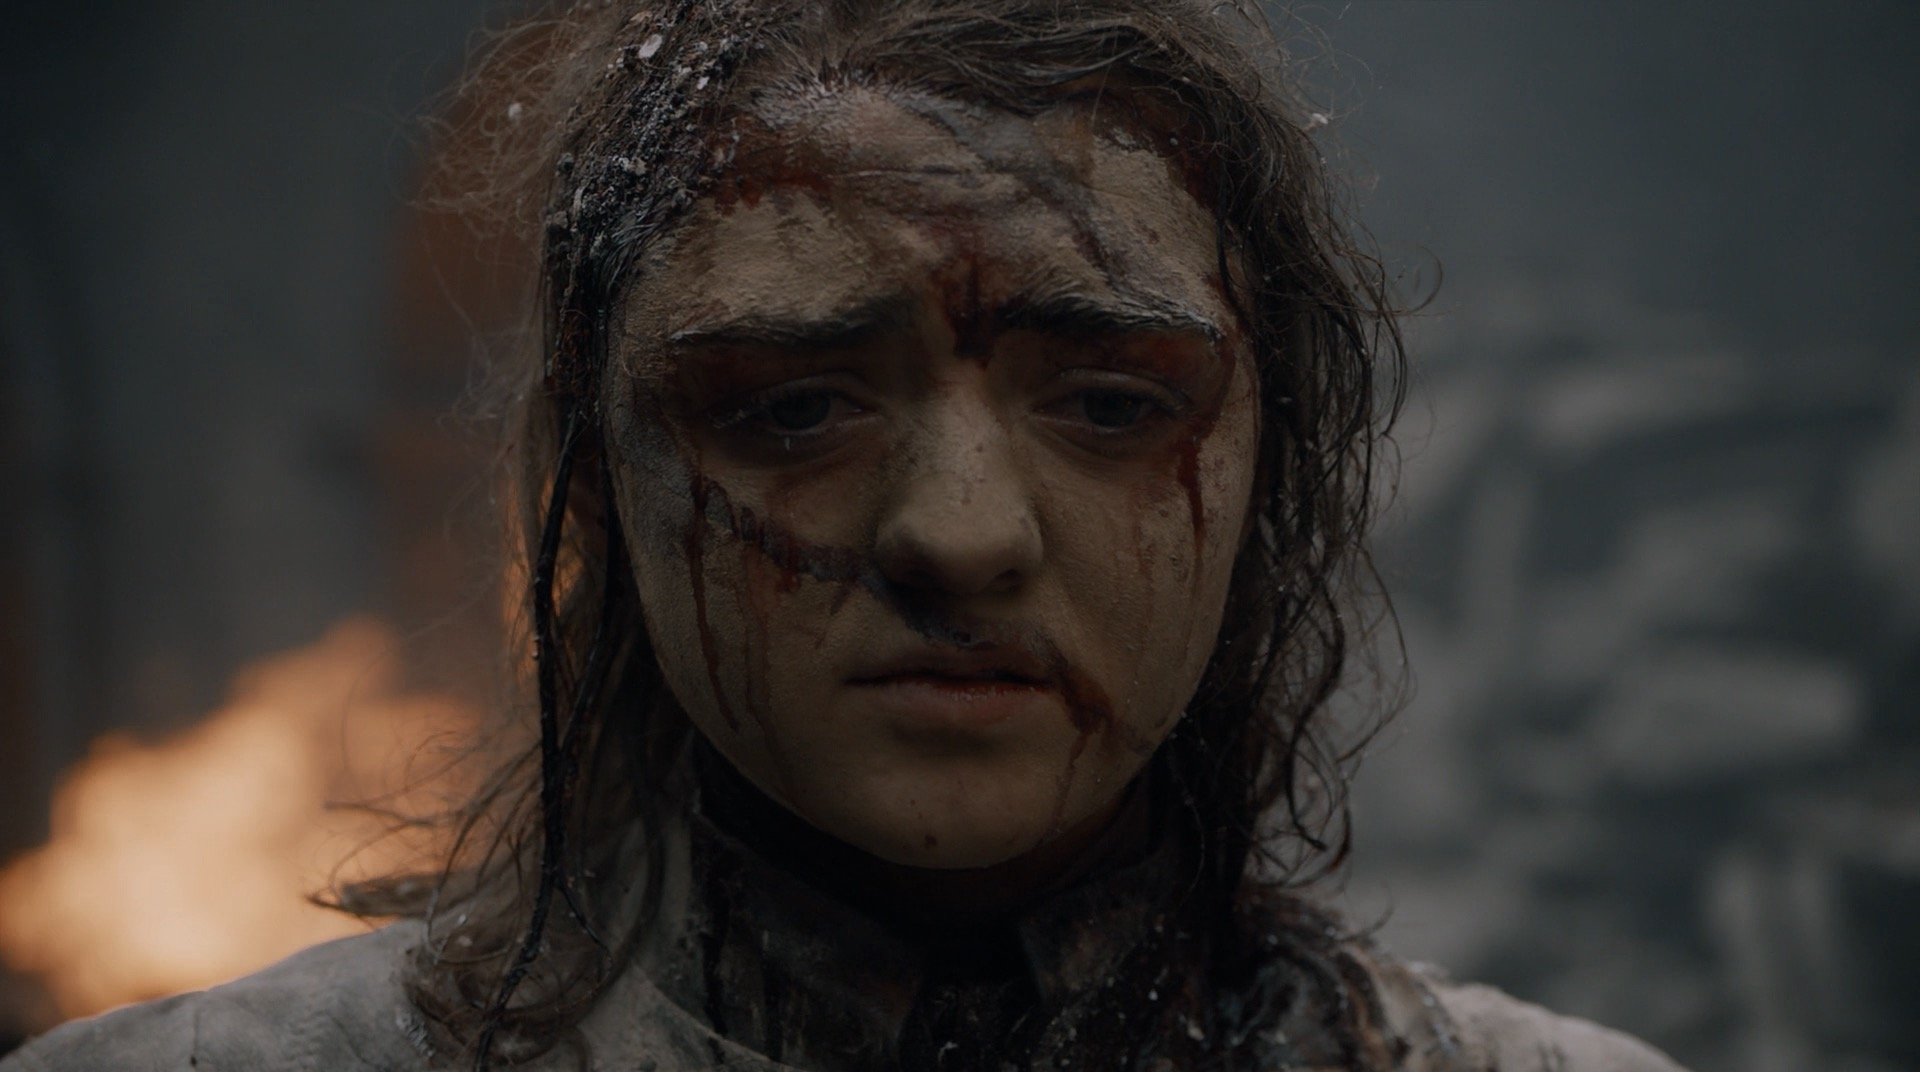 Game of Thrones S08E05 Arya